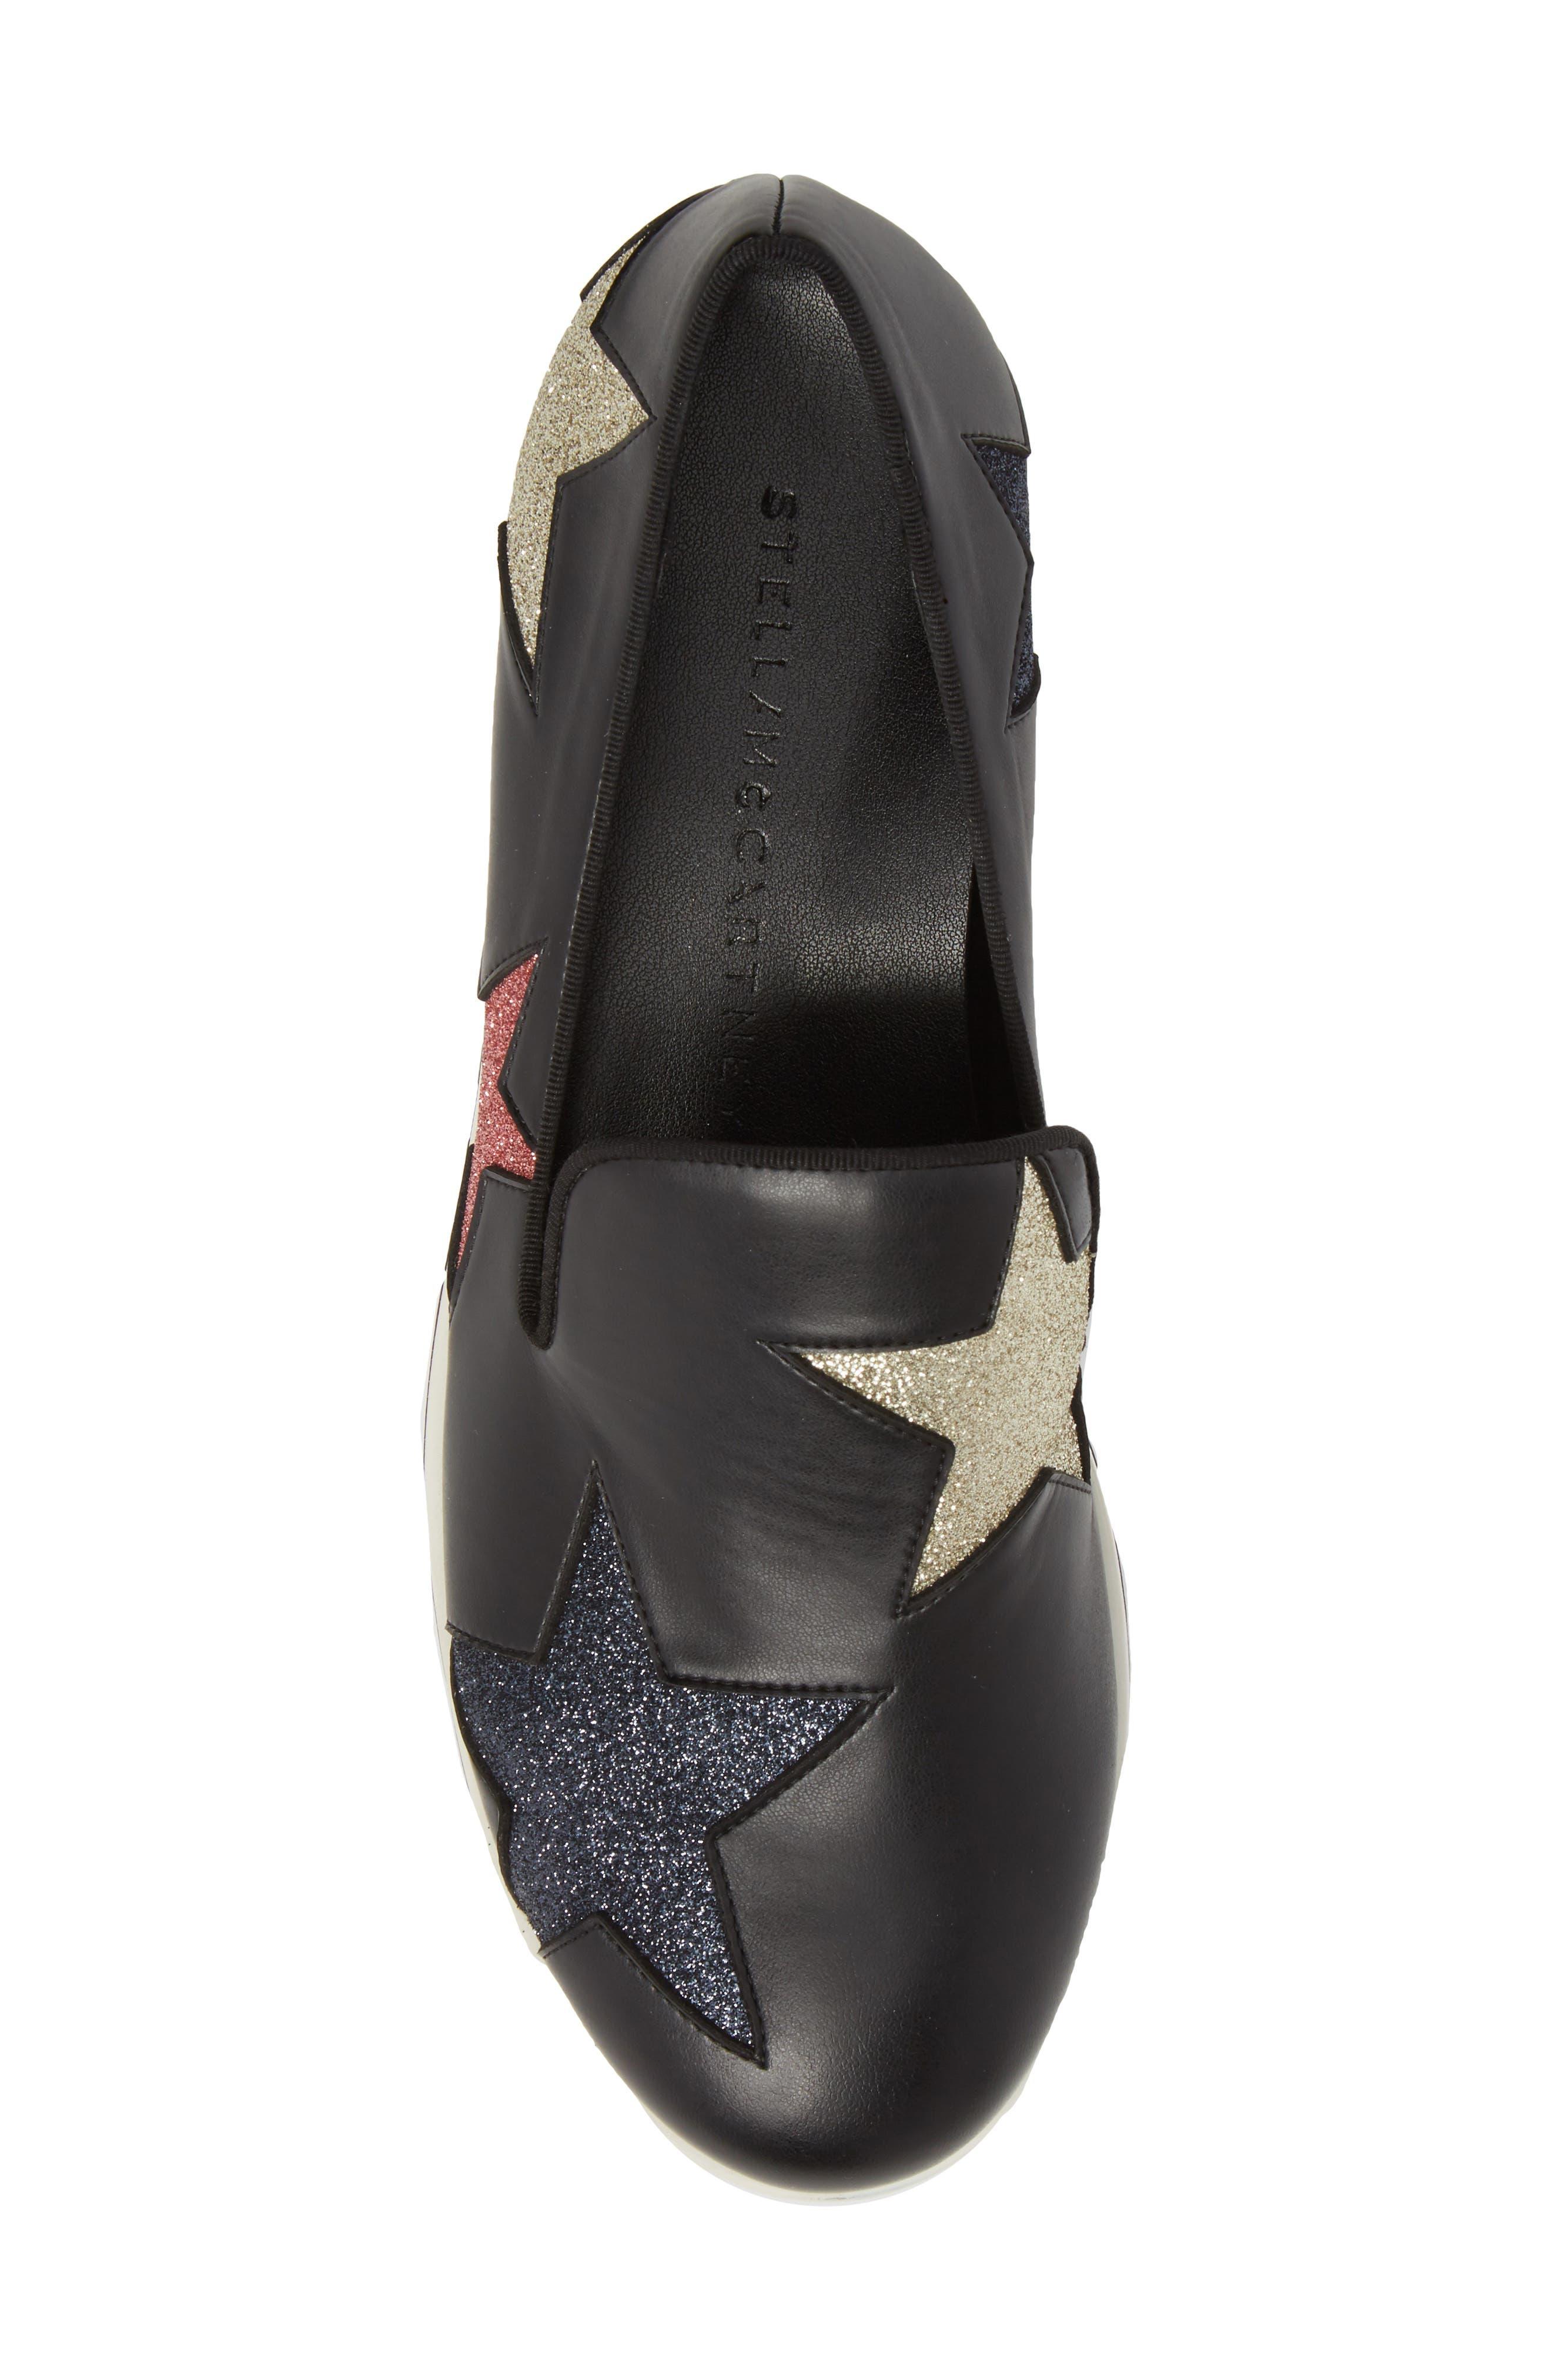 Binx Star Loafer,                             Alternate thumbnail 5, color,                             012